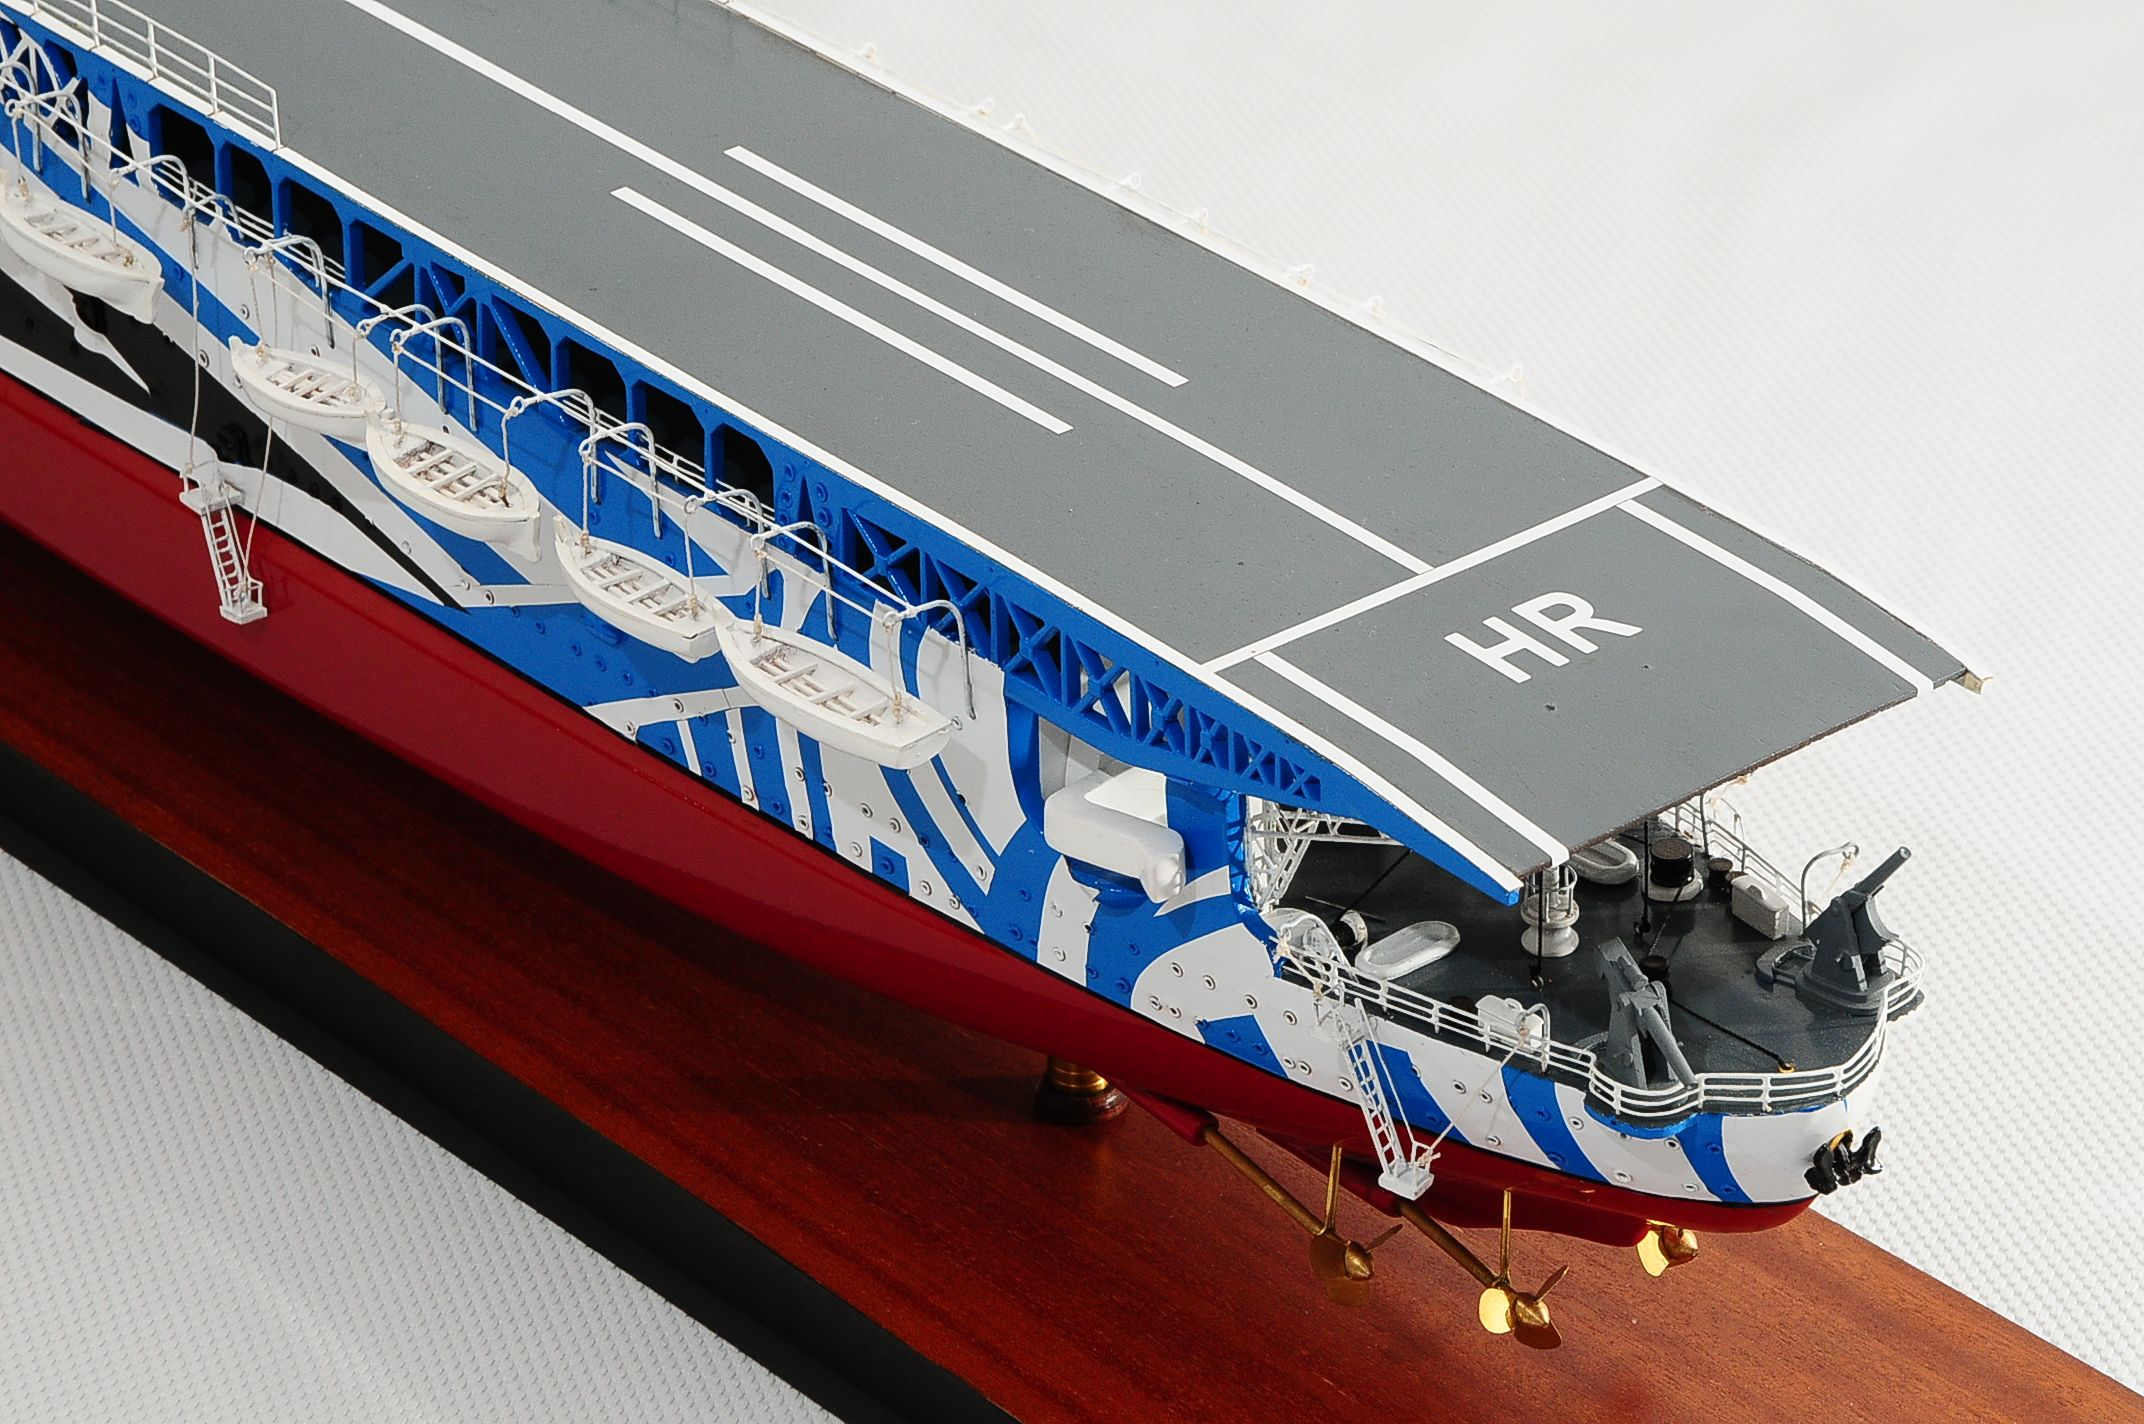 663-6132-HMS-Argus-Model-Boat